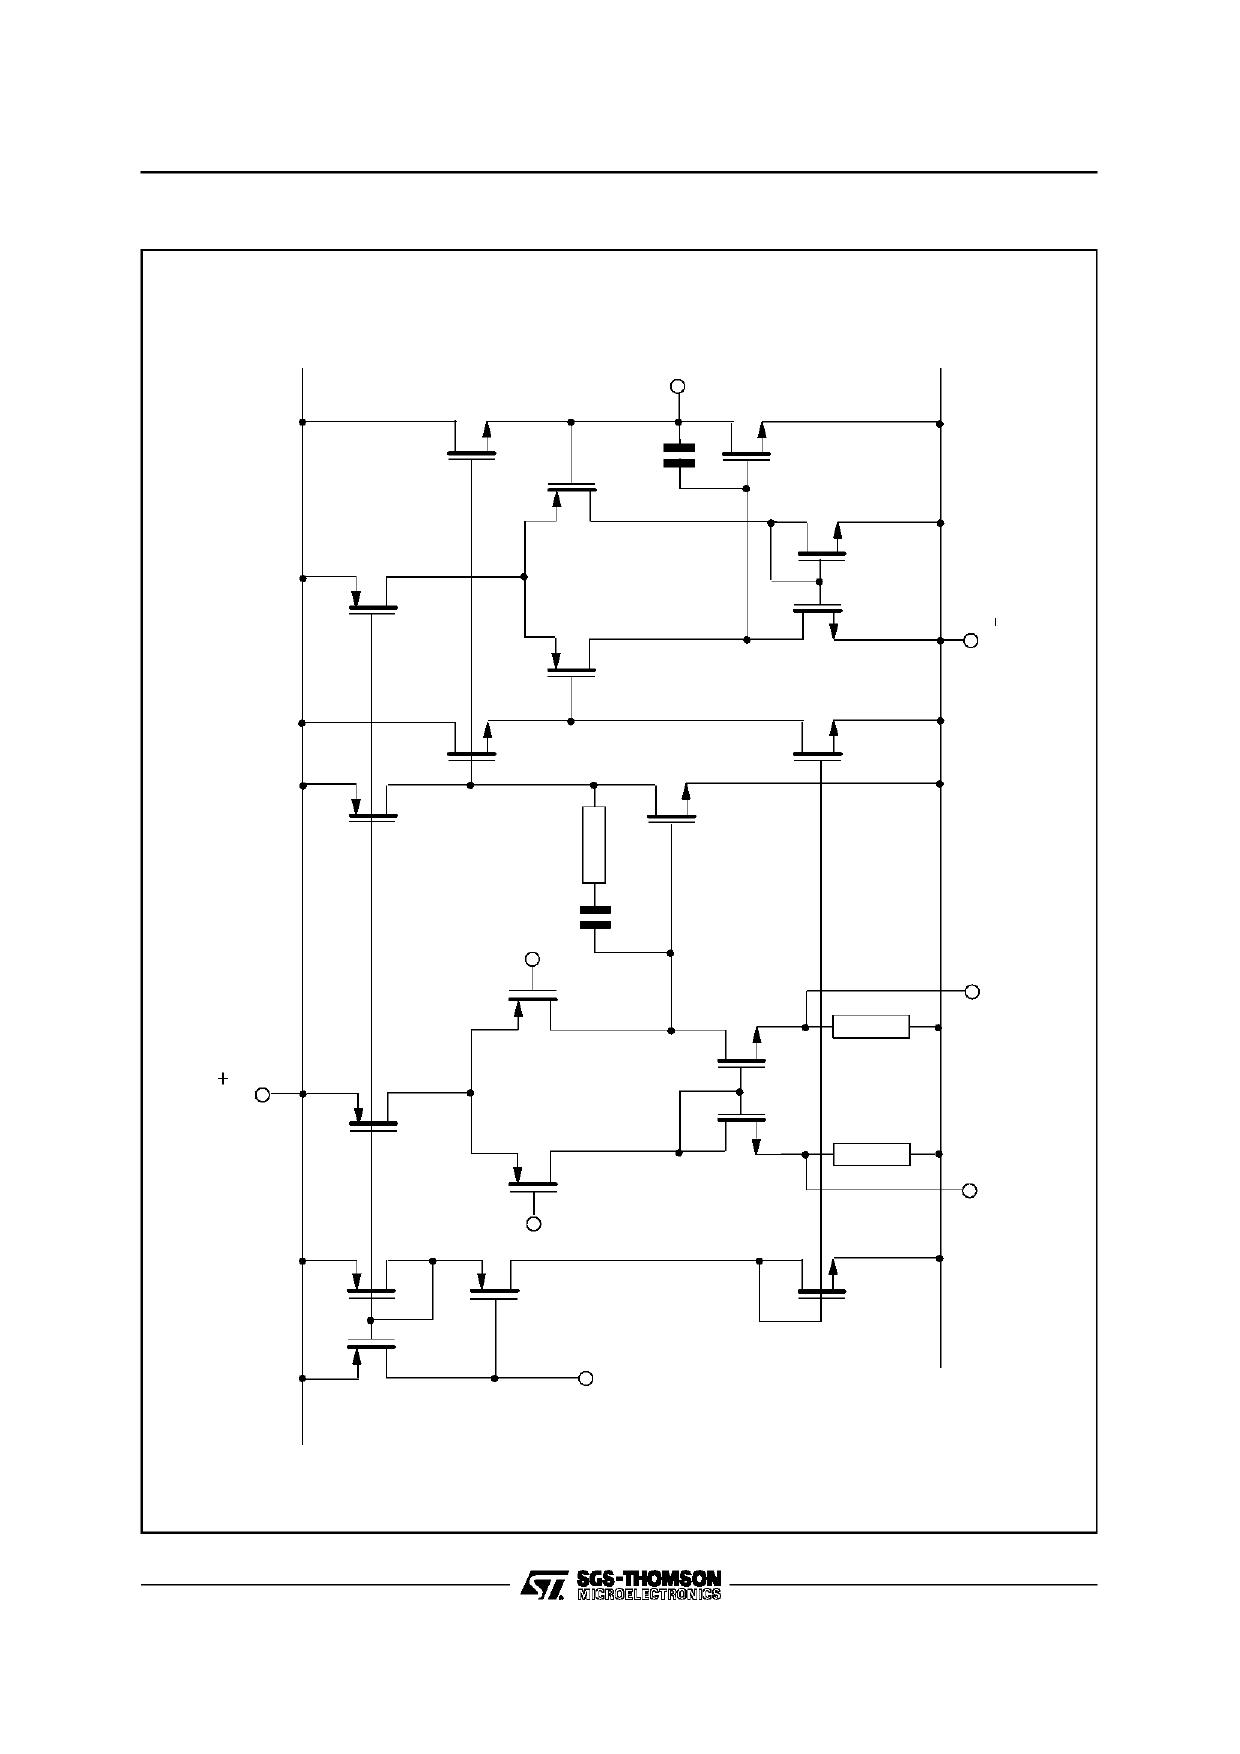 TS271BC pdf, ピン配列